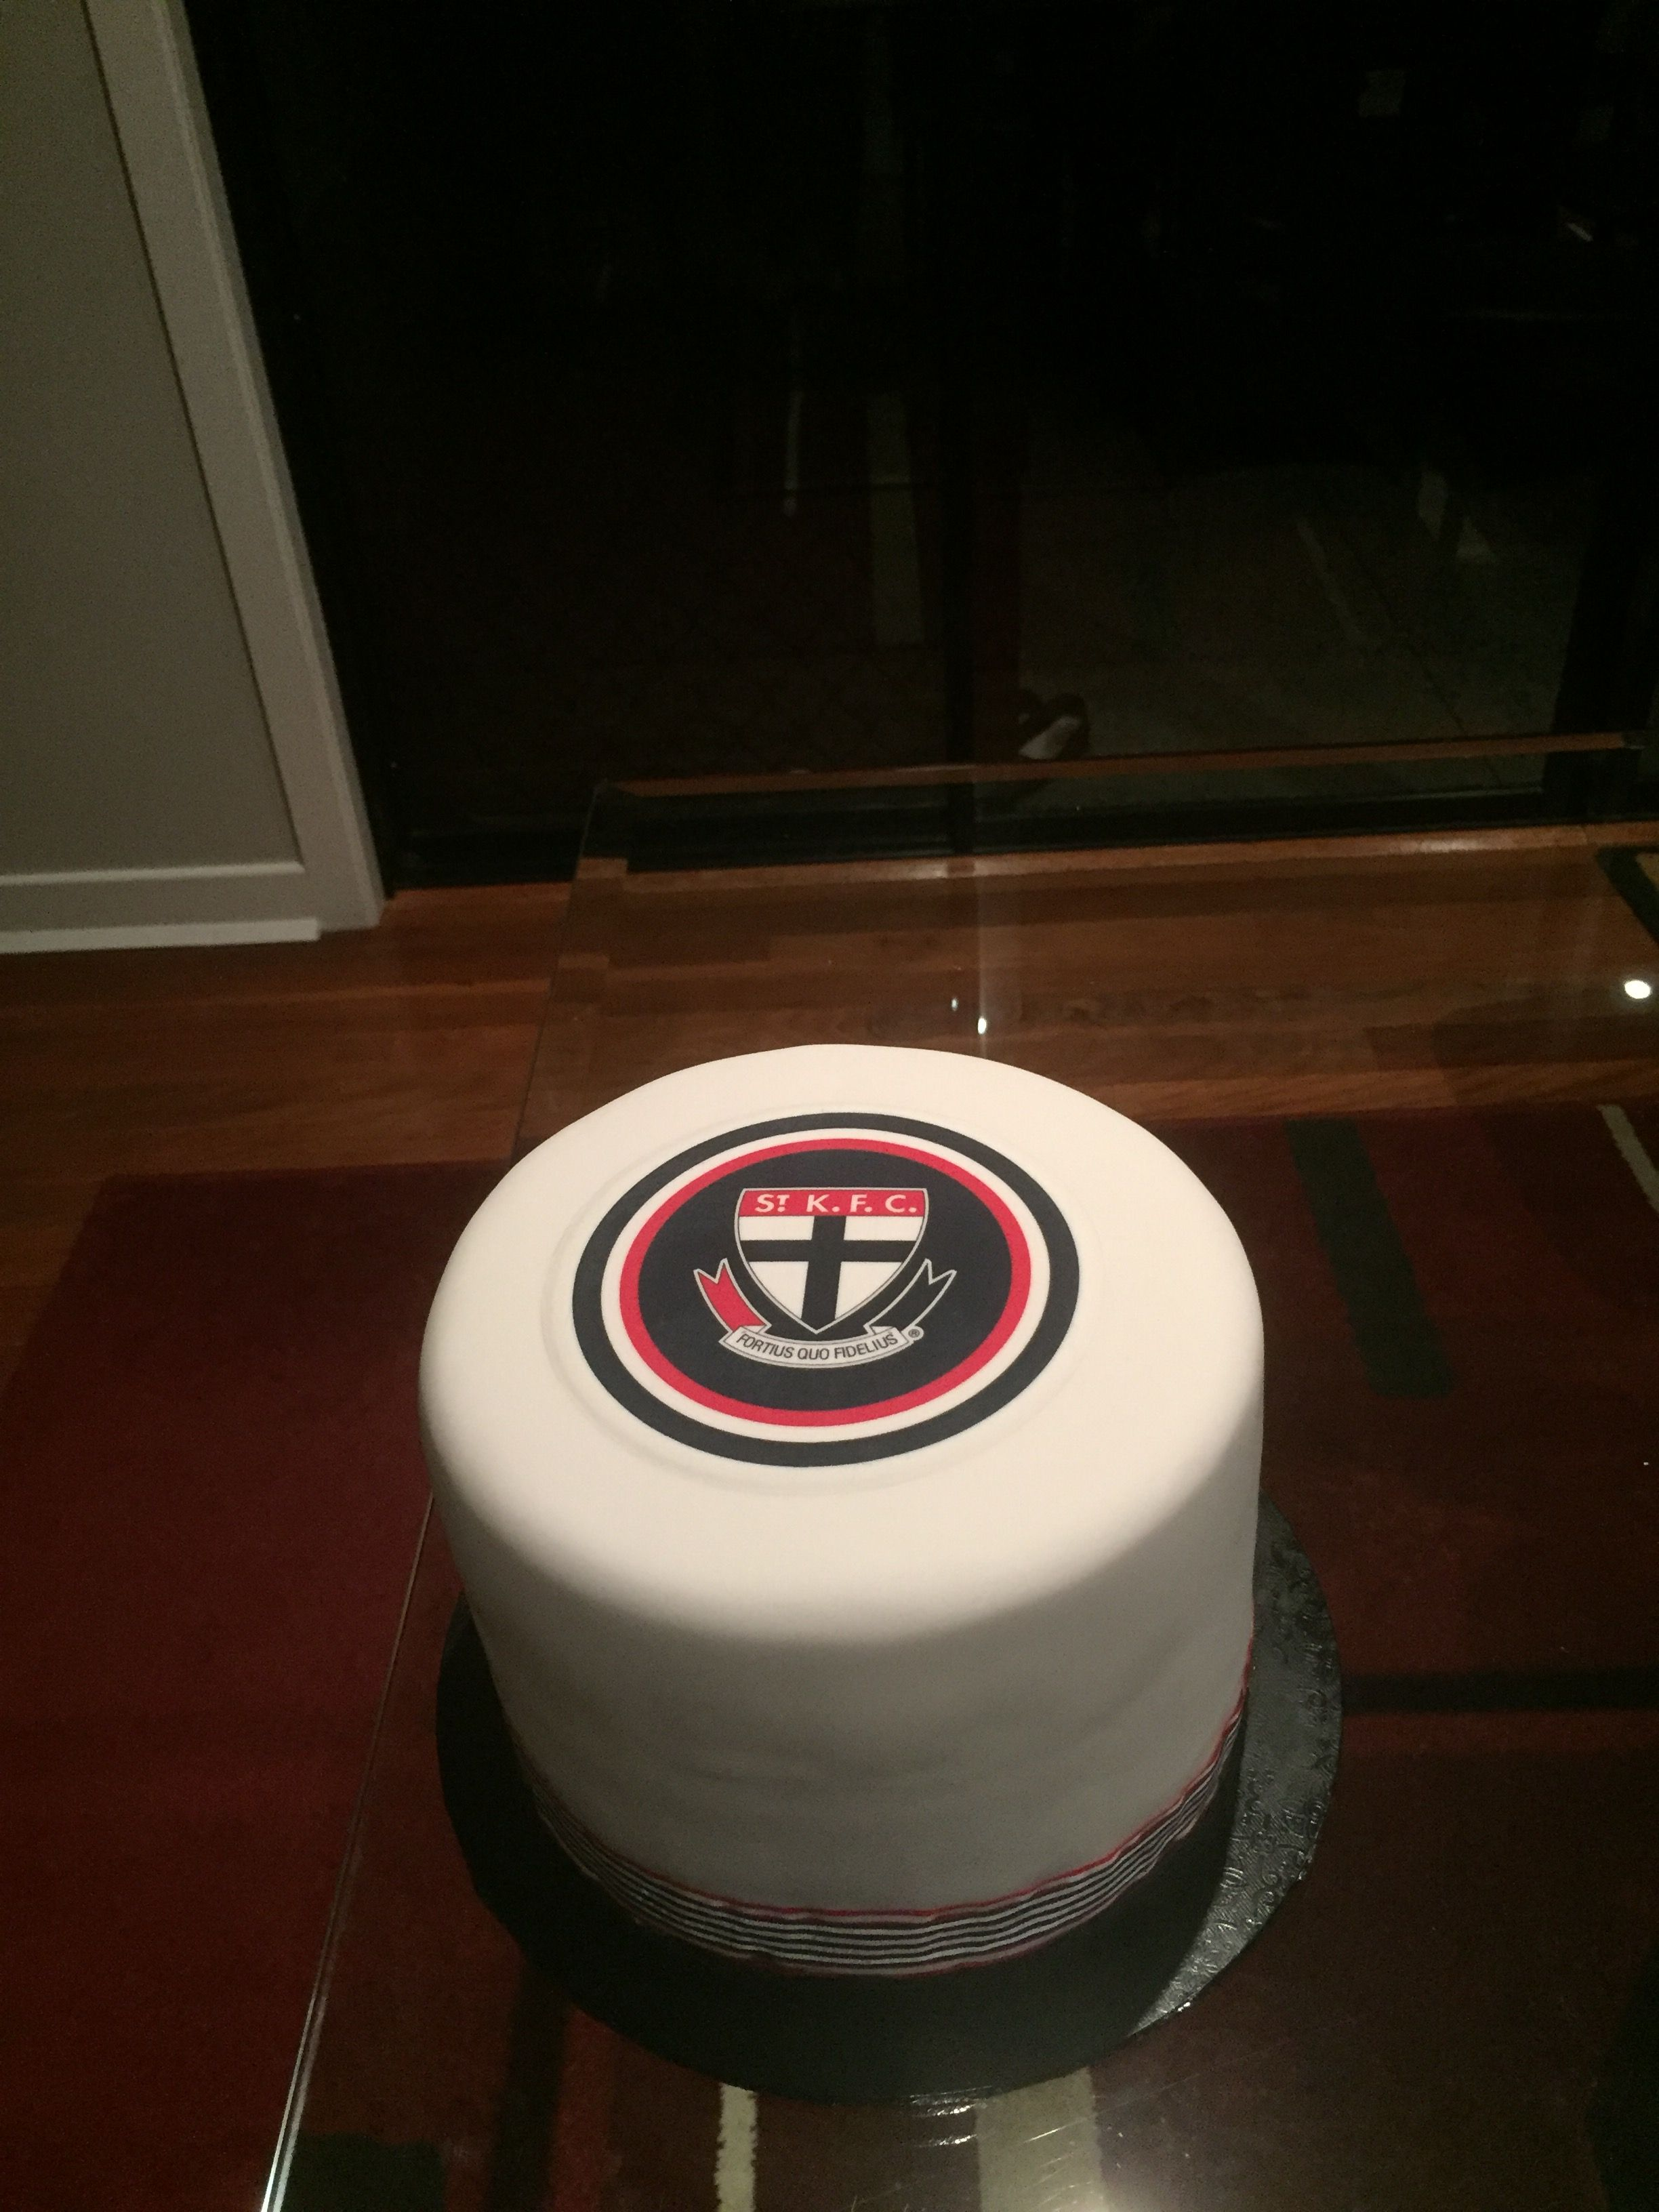 St kilda birthday cake st kilda cake home appliances